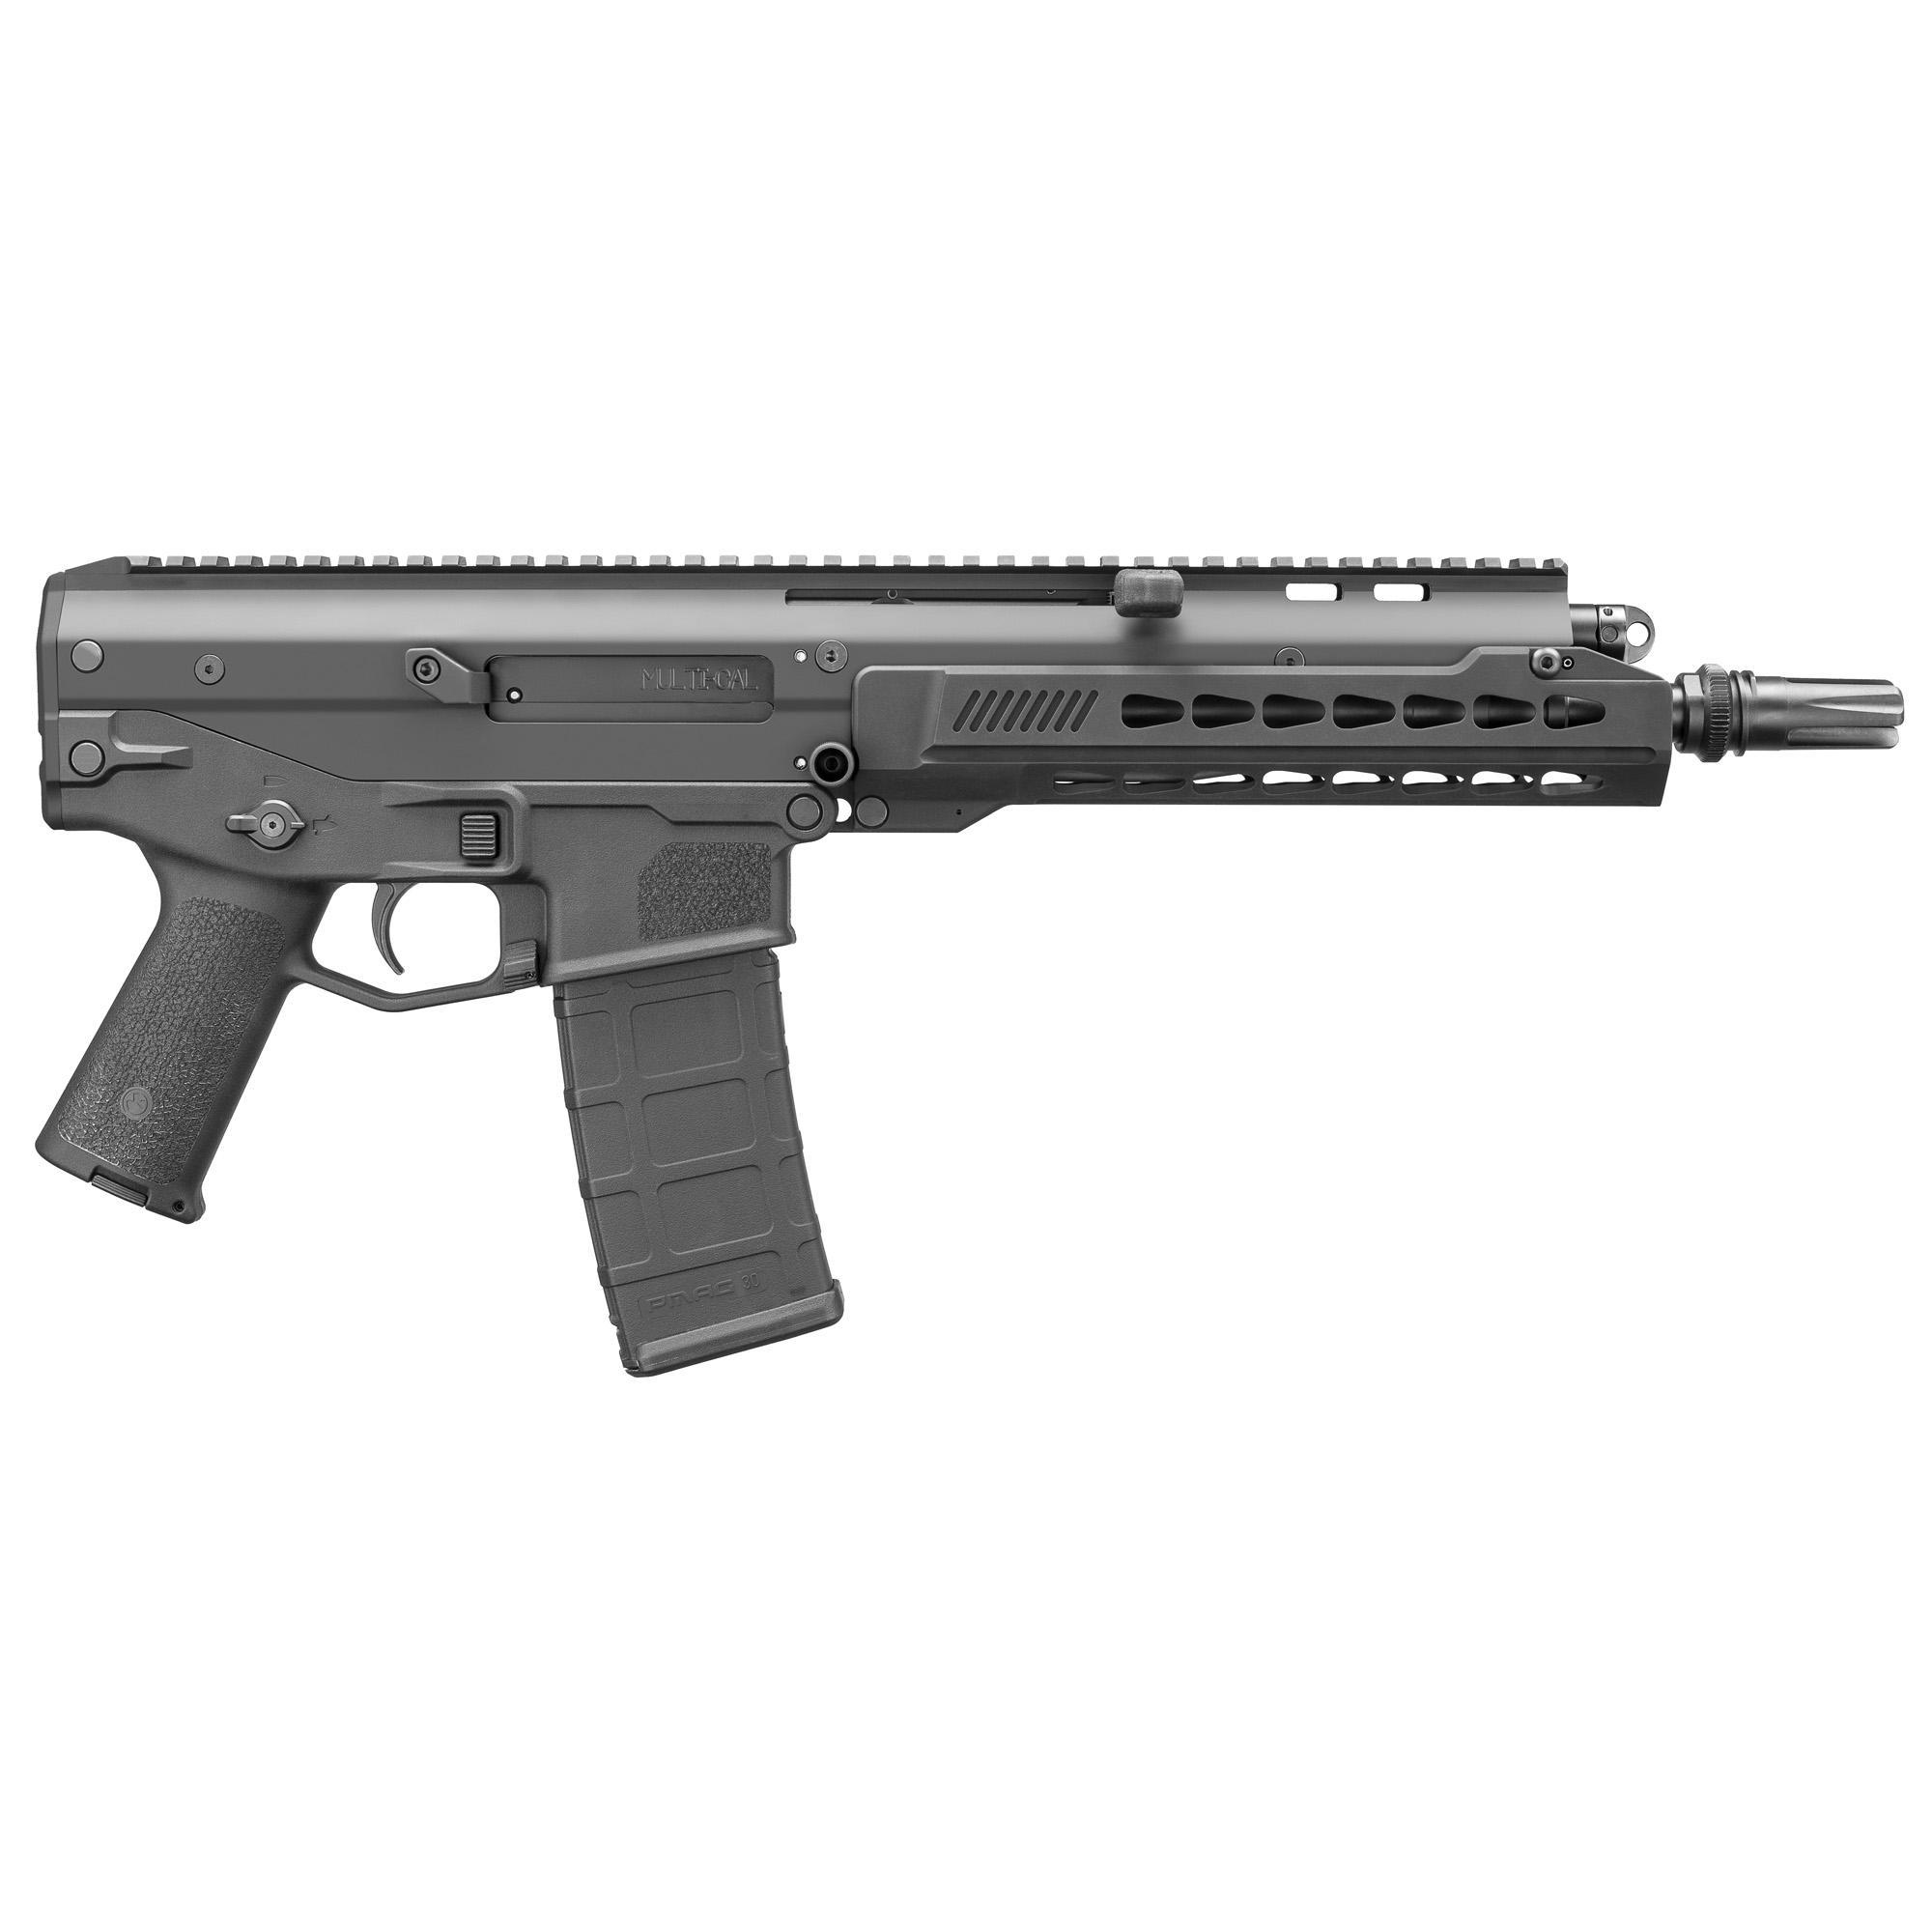 Bushmaster Bushmaster Acr Pistol 223rem 10.5 Black